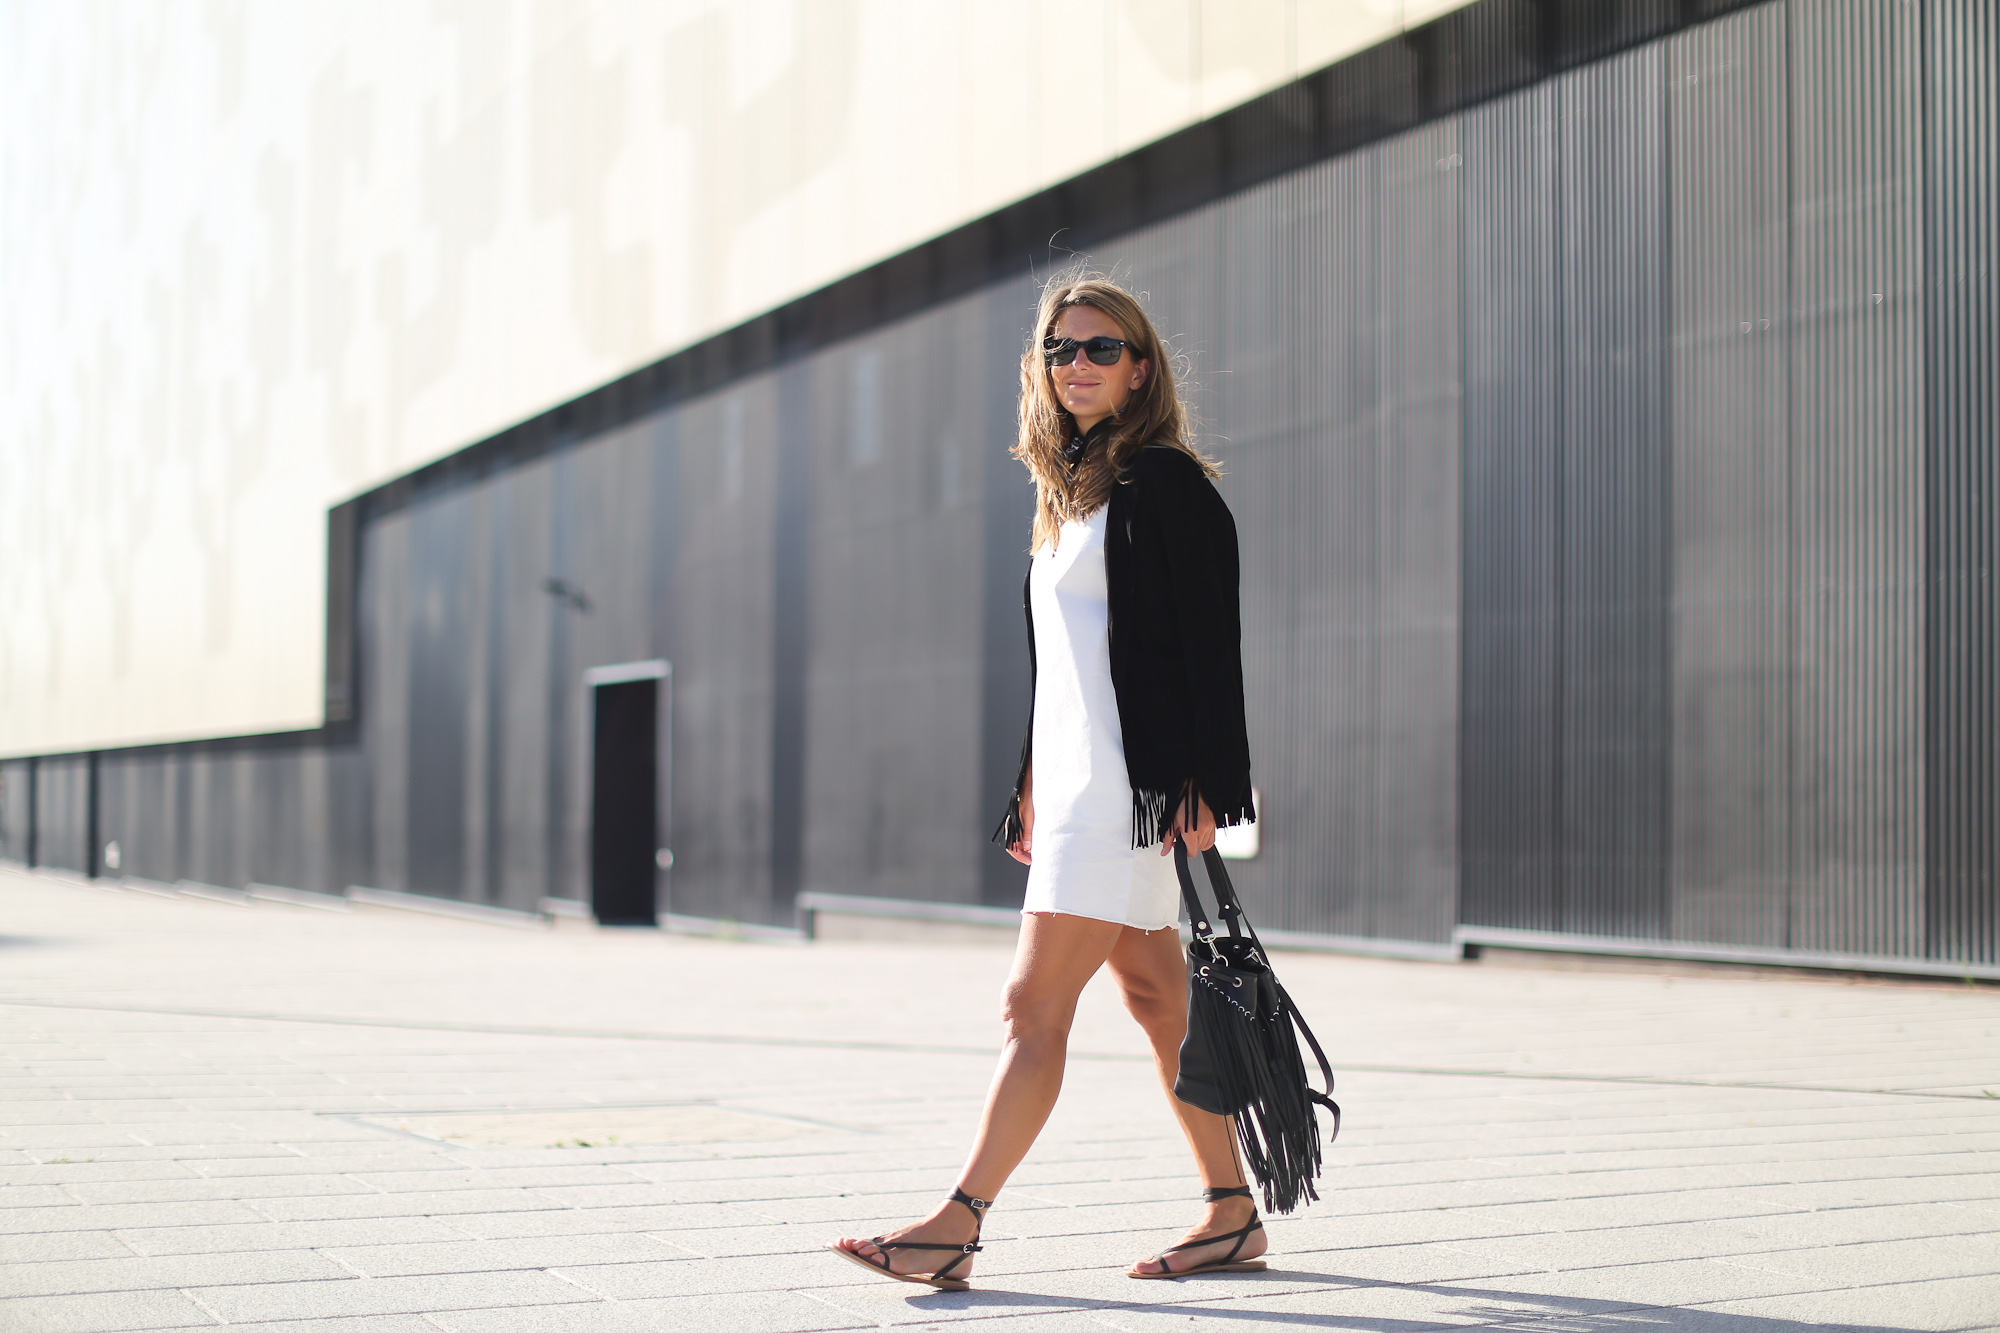 Clochet_streetstyle_sandro_anik_bag_artimisia_roman_leather_Sandals-4